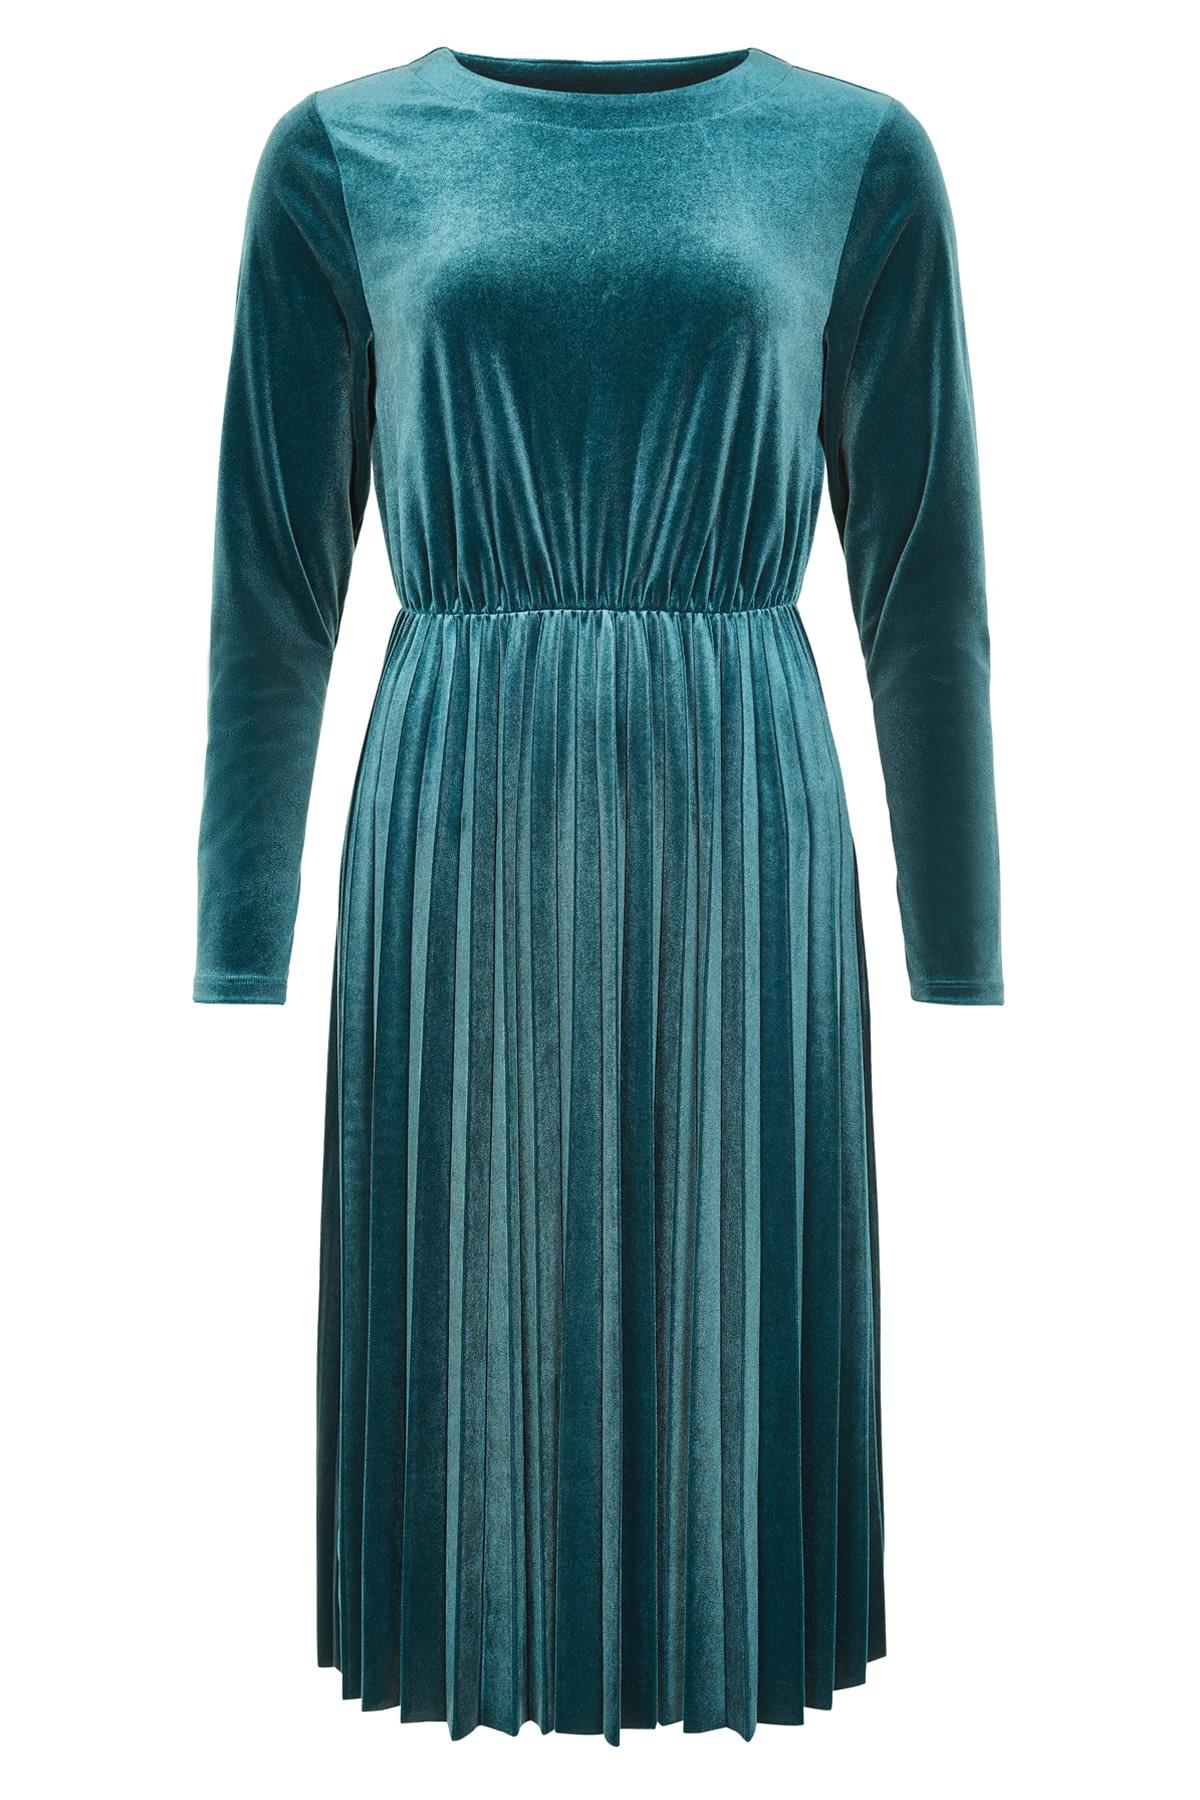 Nümph Nakotah Dress